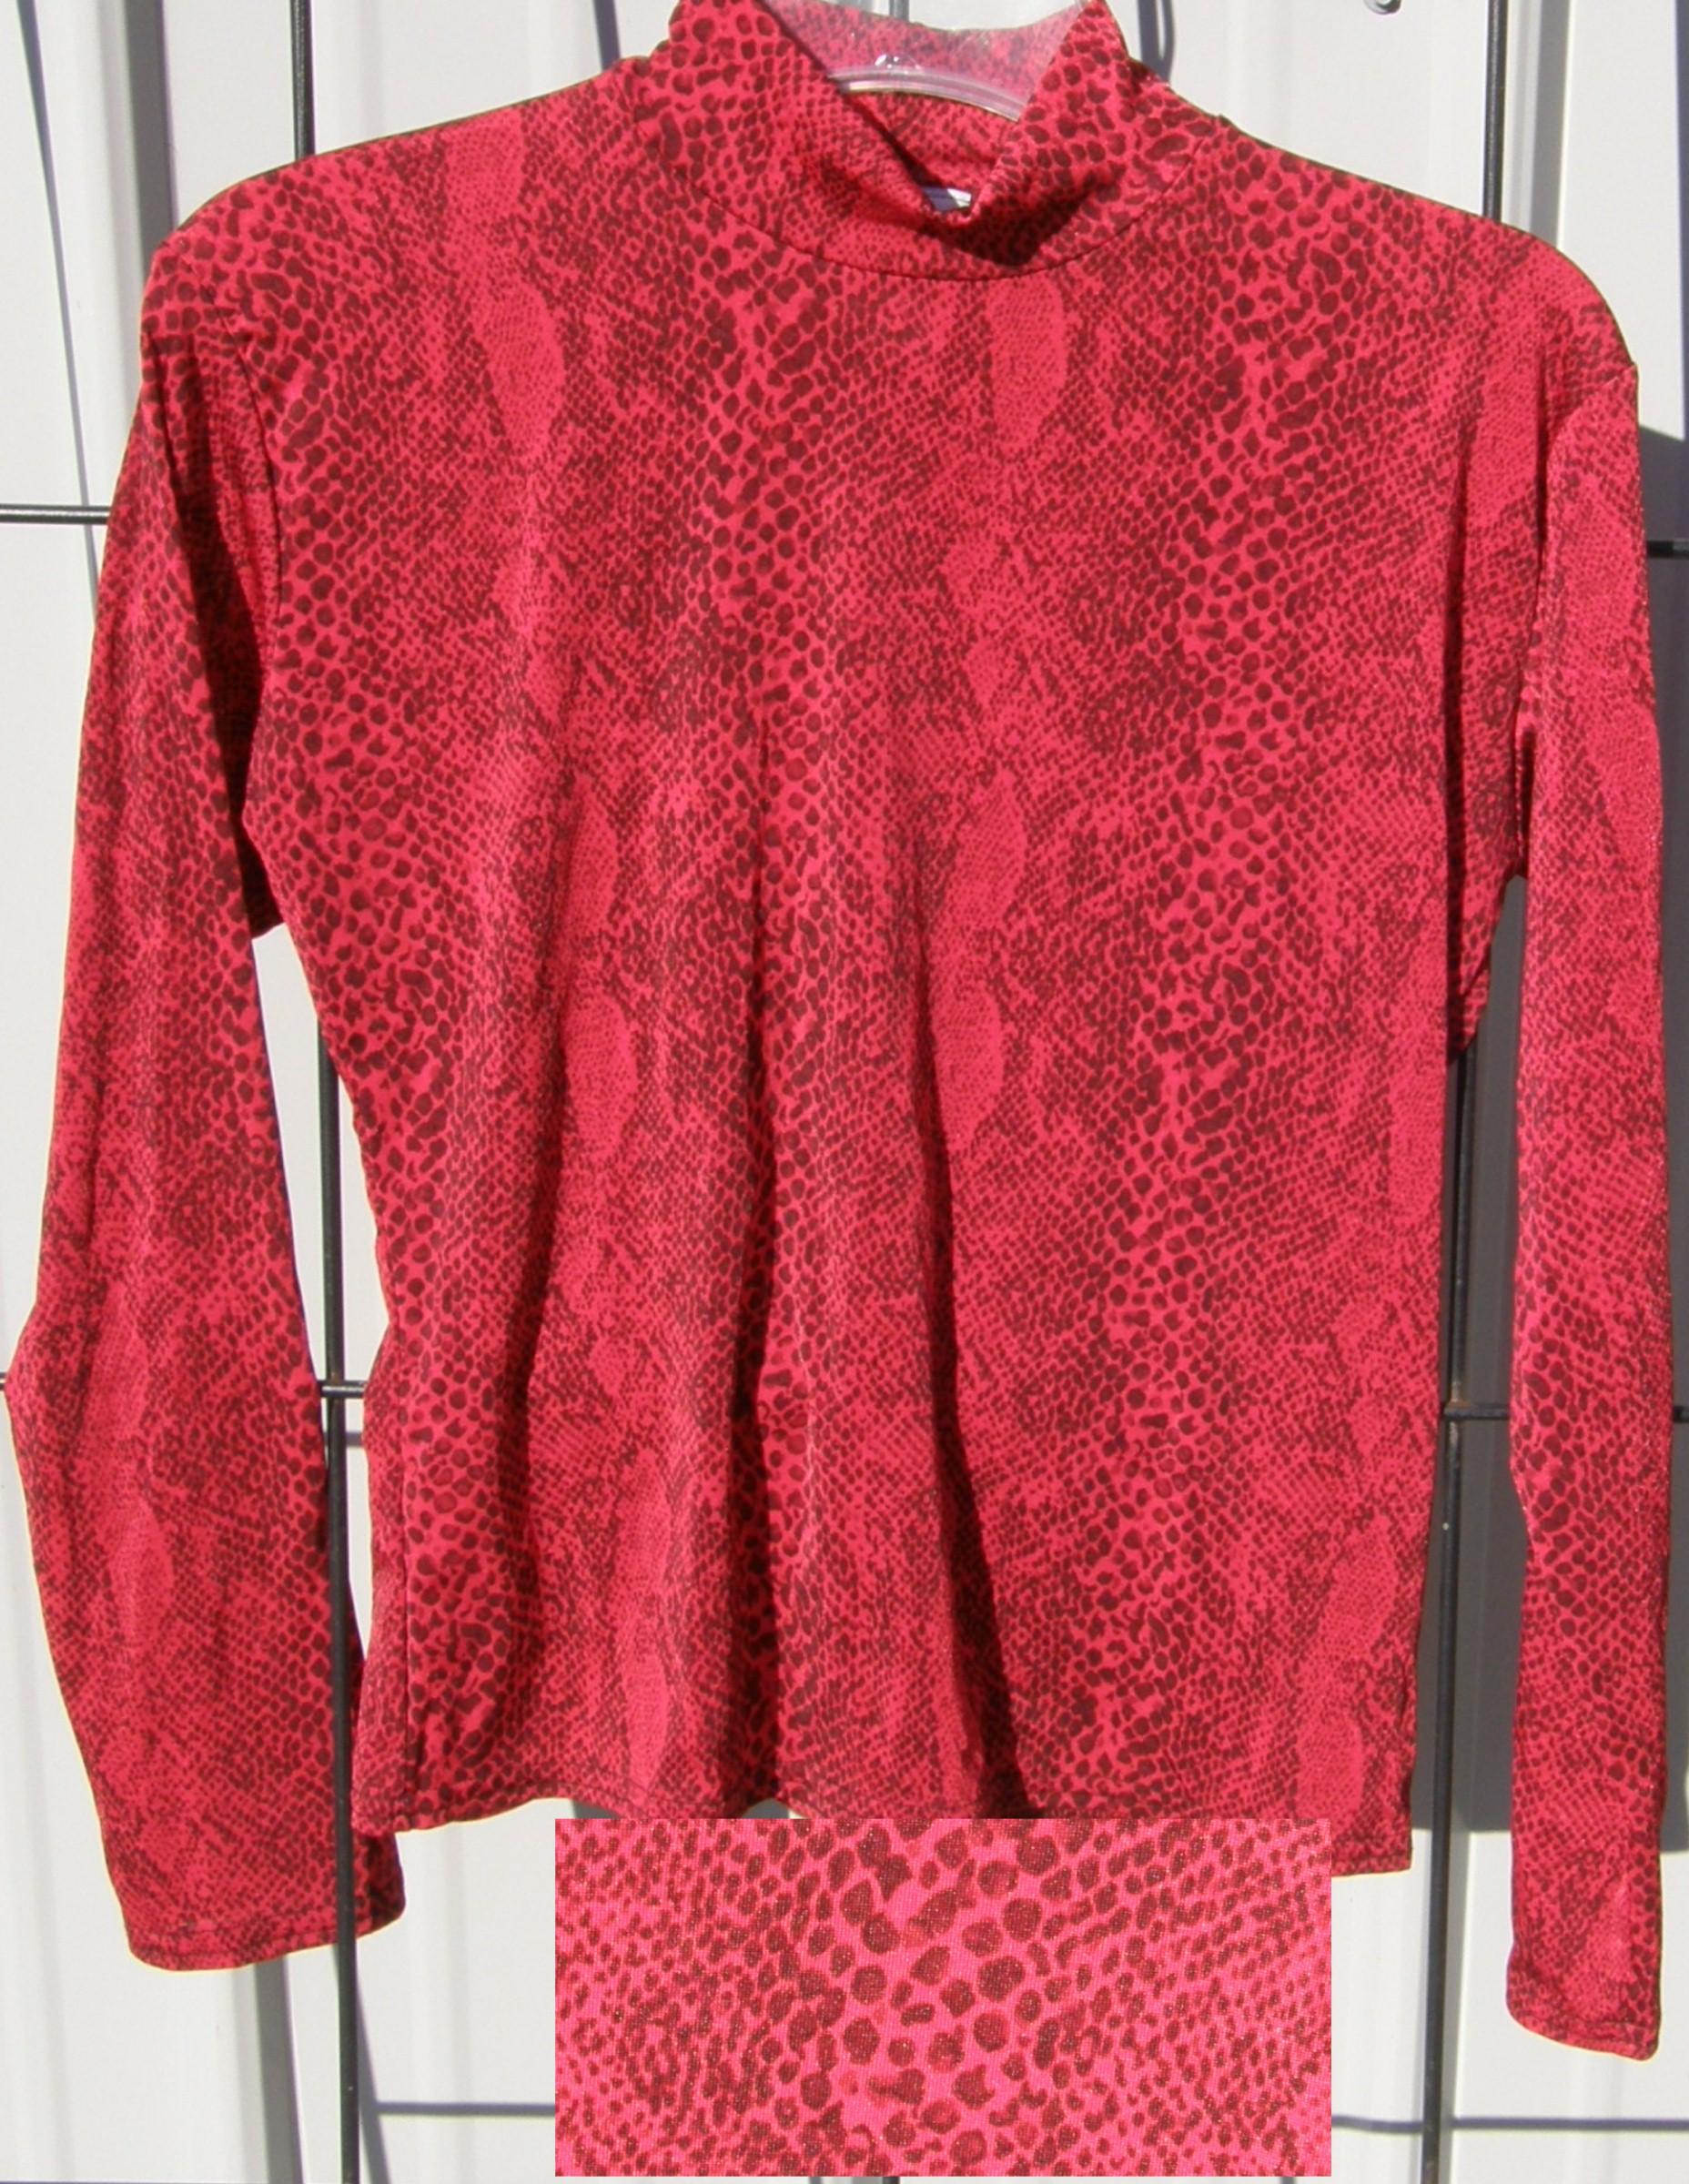 816bb2e6 ... FTWW Slinky Top Western Show Shirt Red Snakeskin Print Red Python Print  Ladies L ...